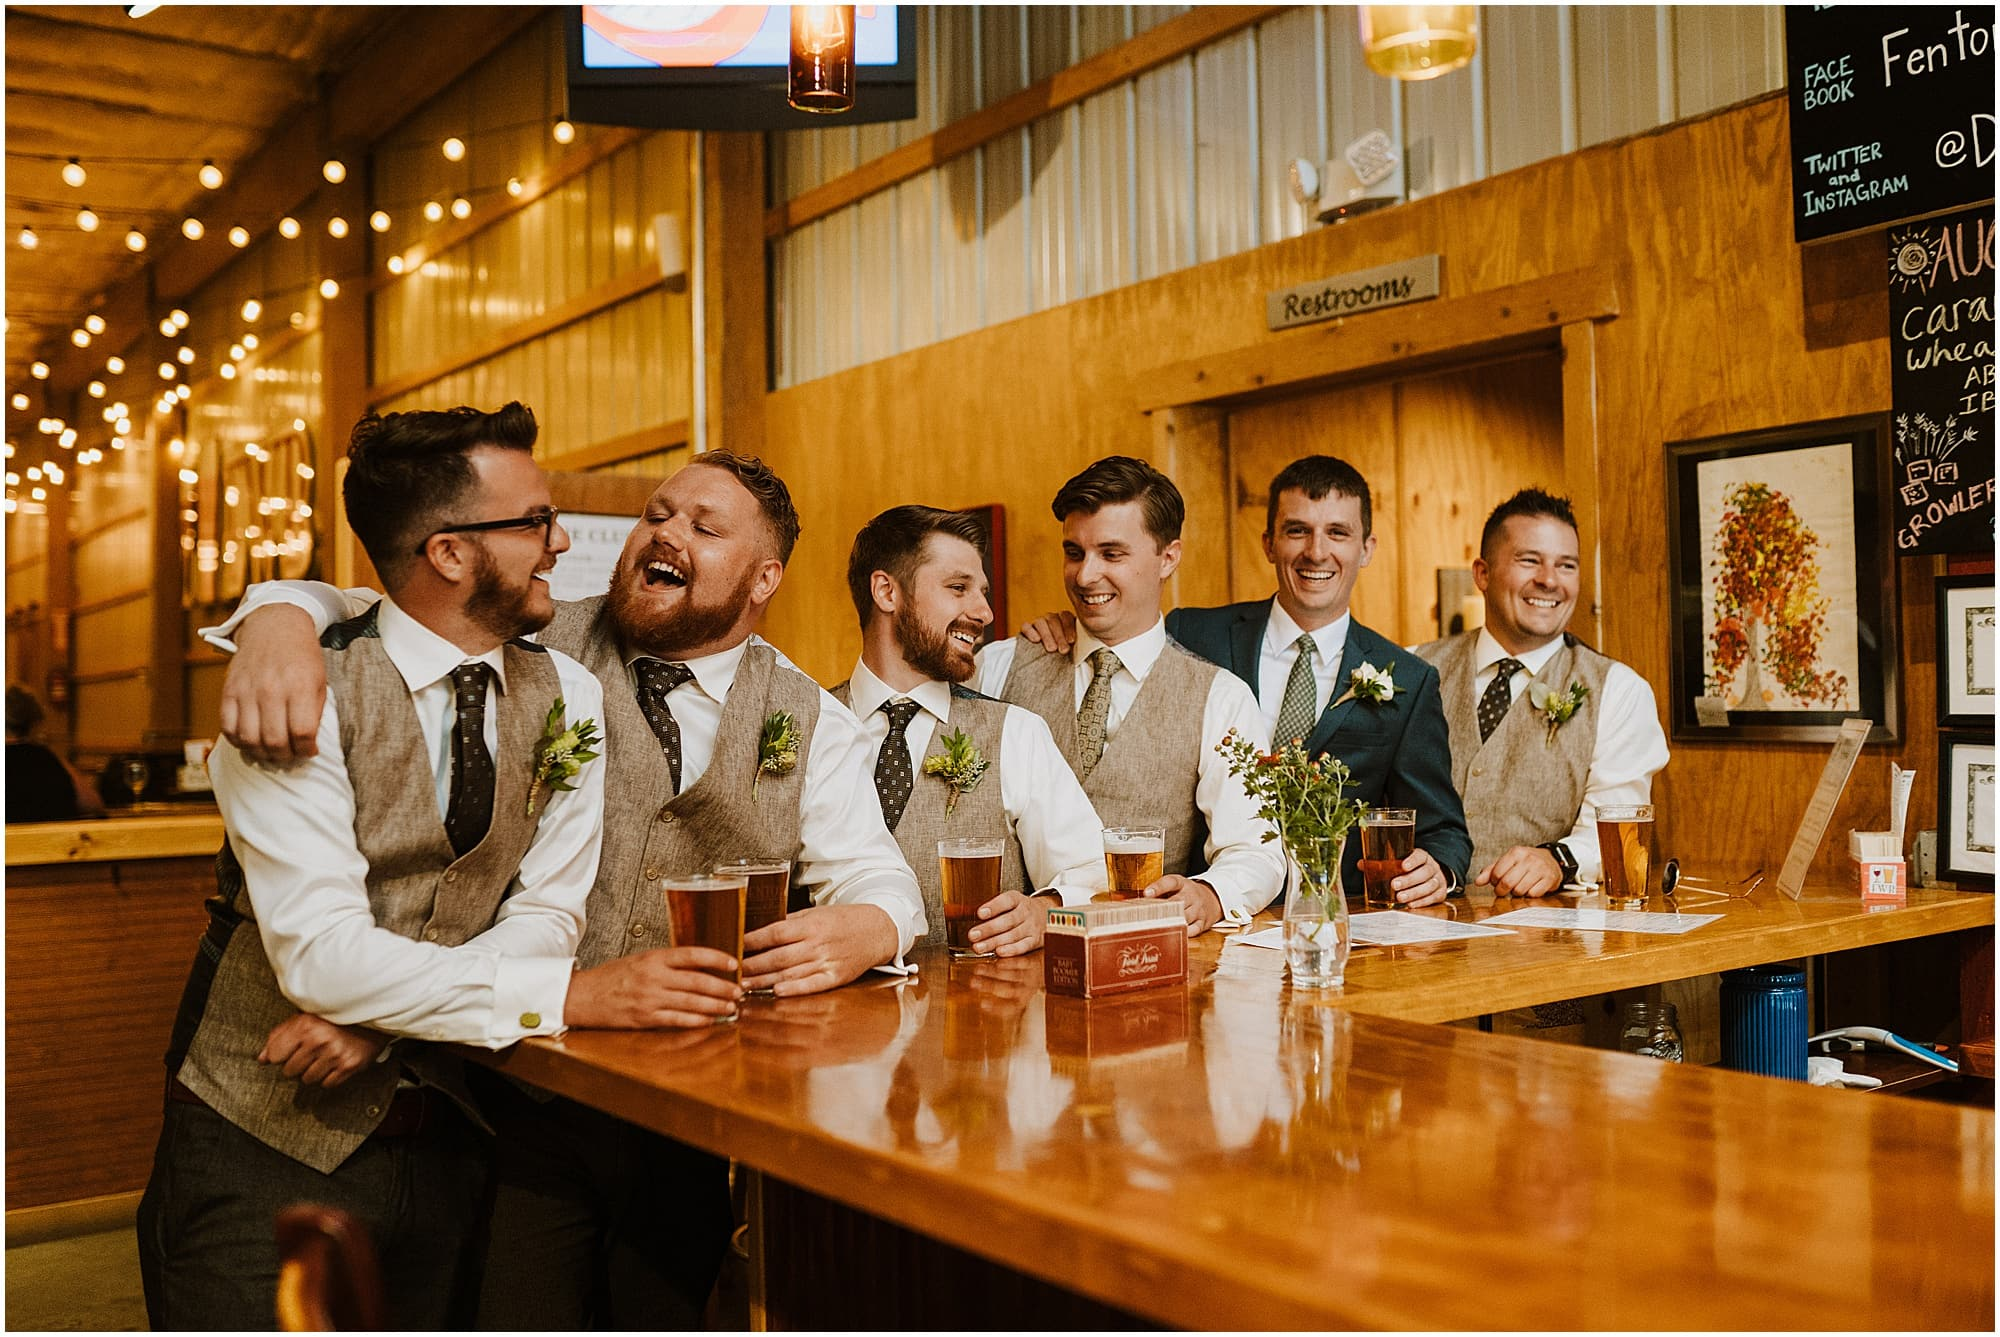 Summer Fenton Winery & Brewery Wedding_0074.jpg